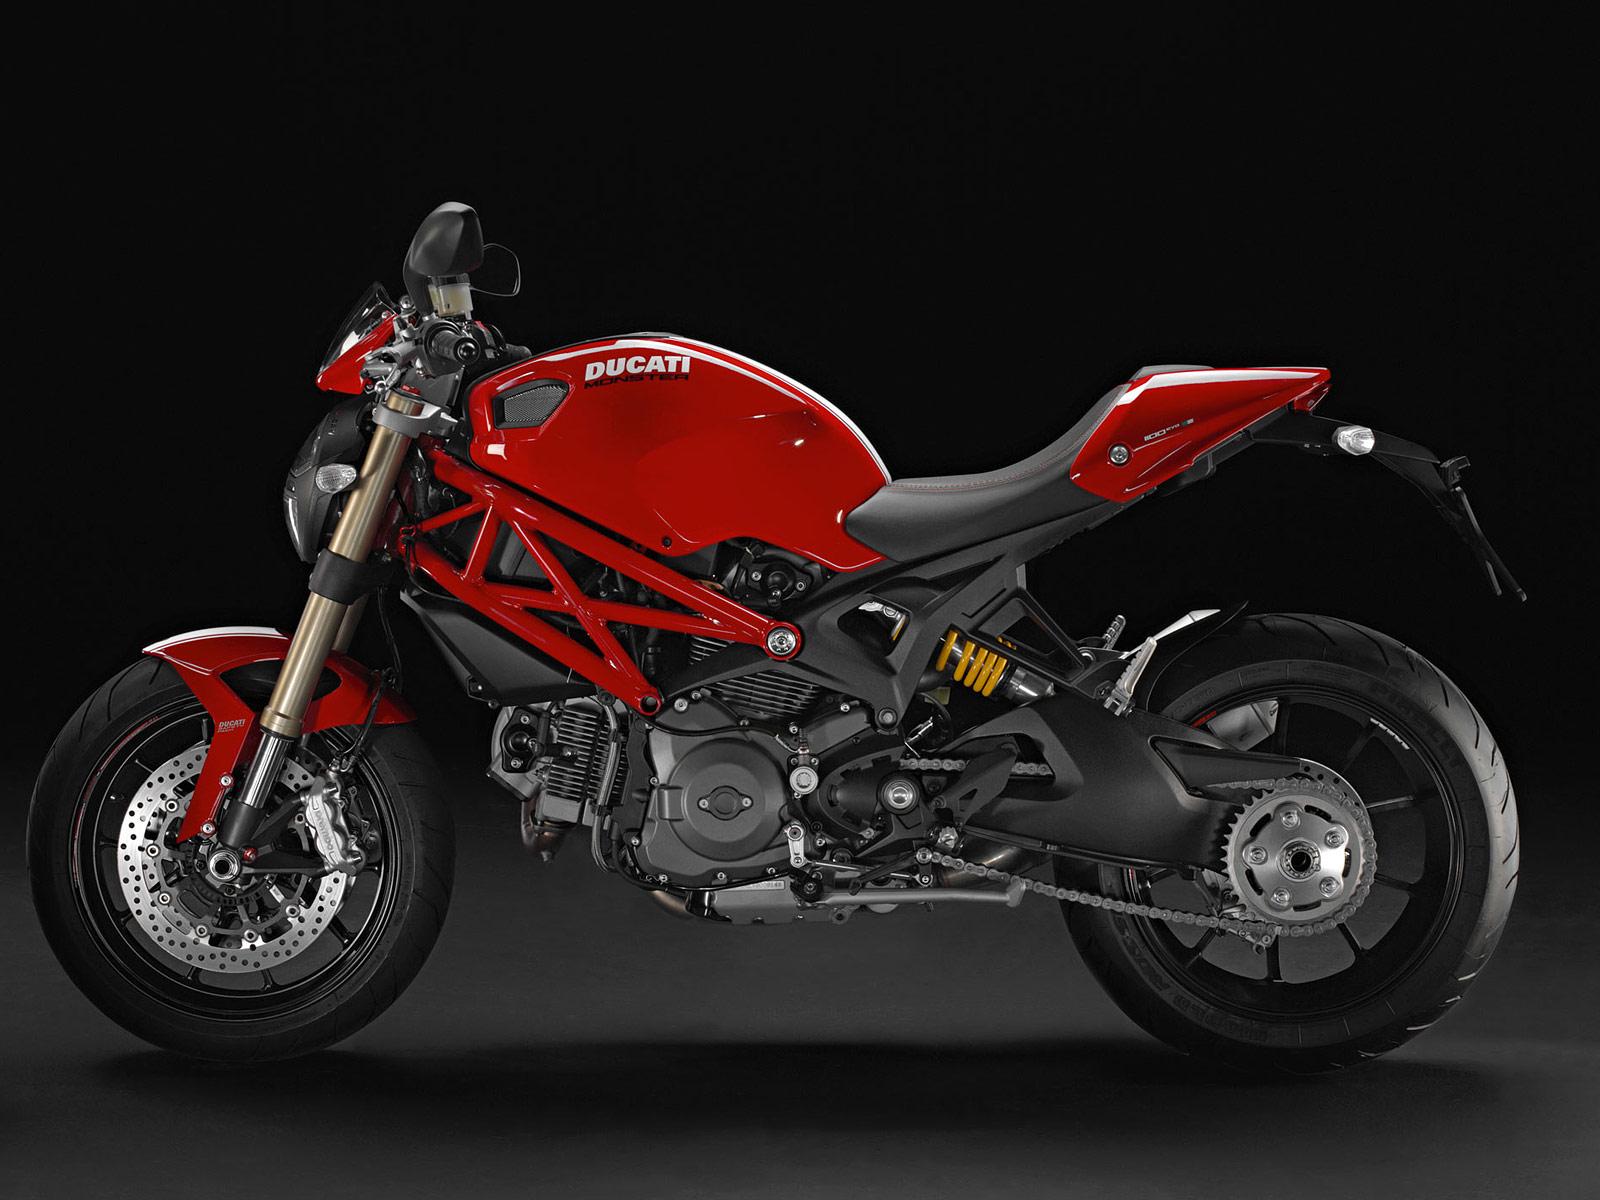 2013 Ducati ... Ducati Monster 1100